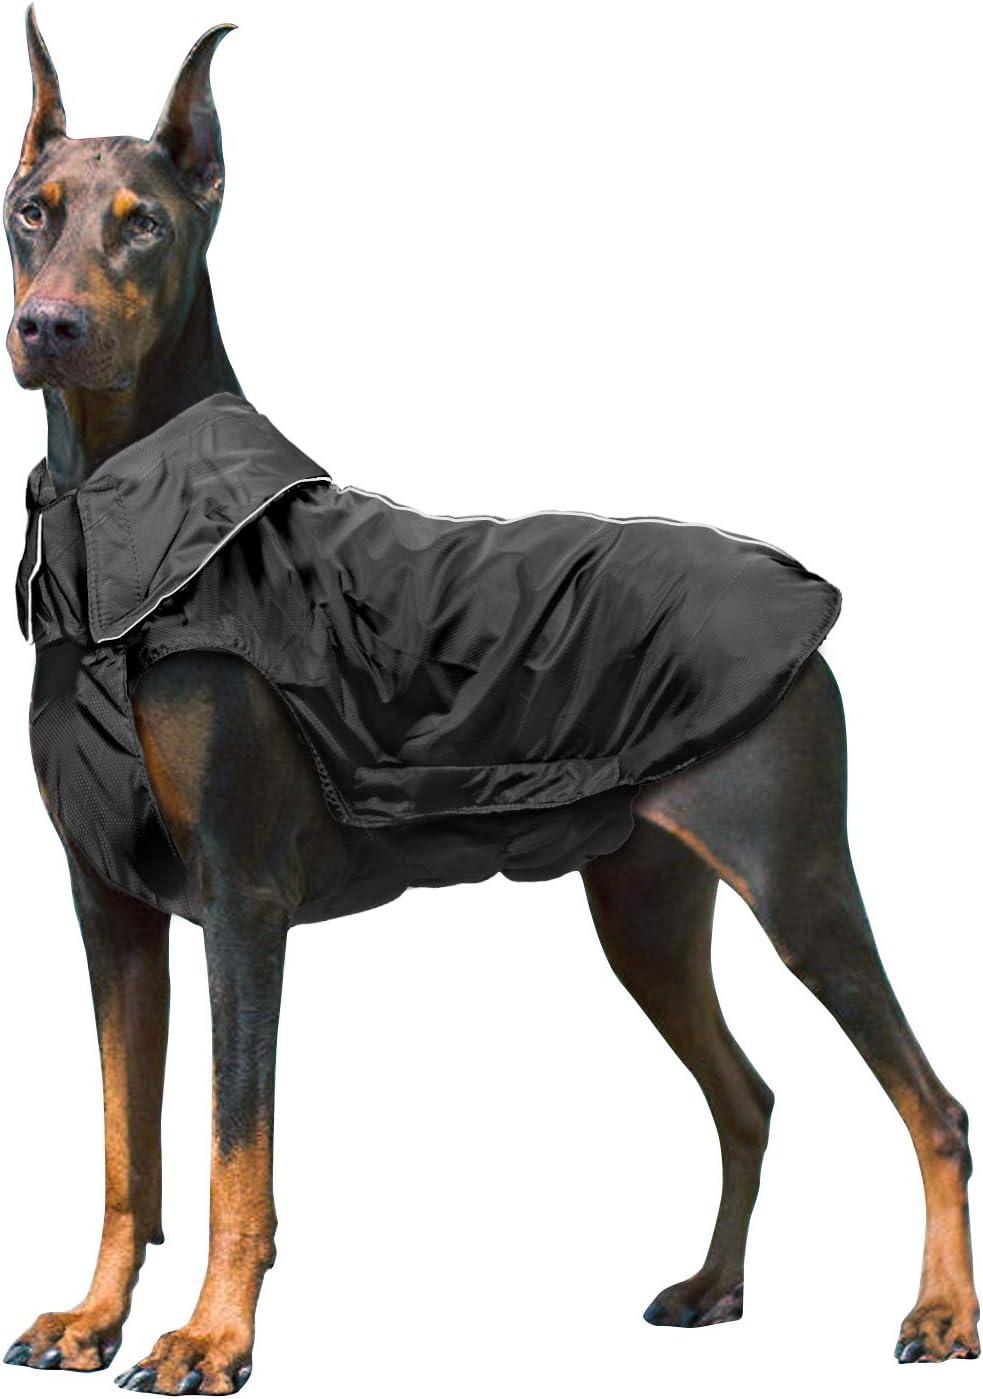 IREENUO Chaqueta 100% Impermeable para Mascotas Perros Abrigos de Invierno cálido Negro-3XL